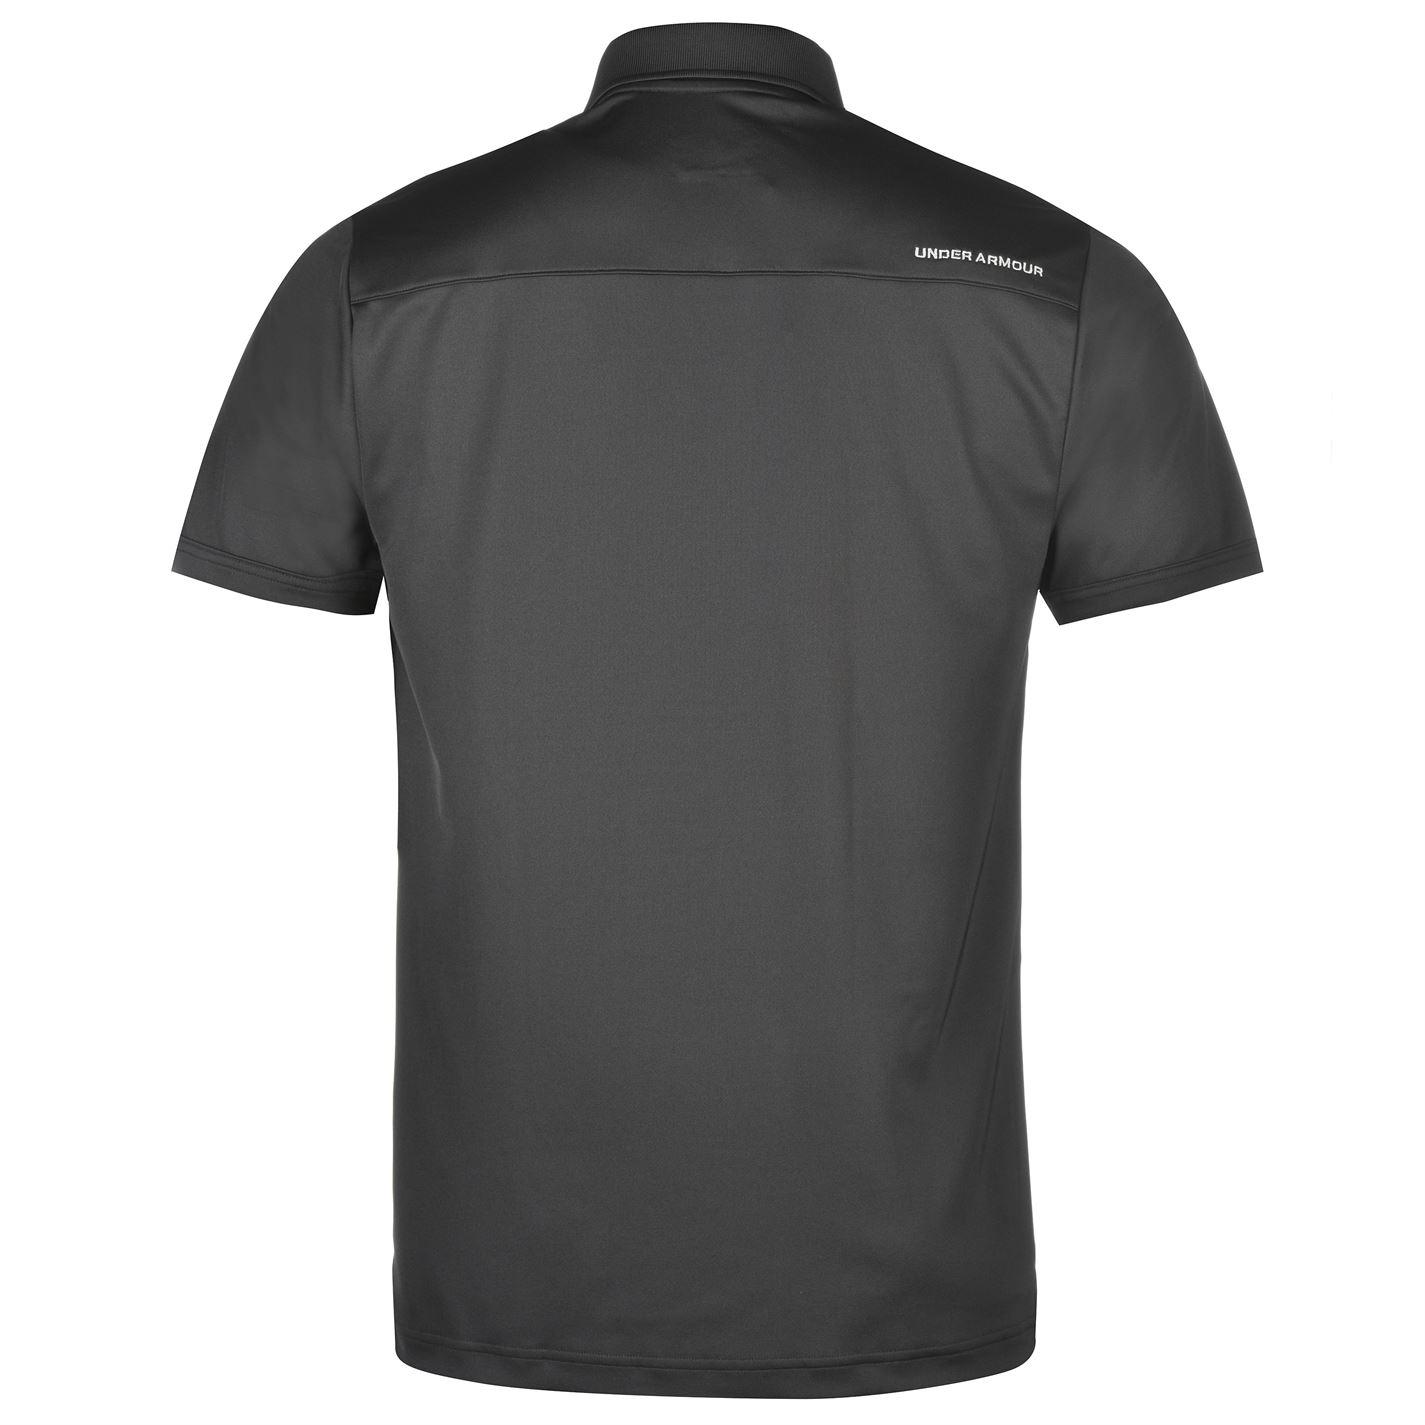 Under-Armour-Camiseta-Polo-para-hombre-realizar-Manga-Corta-Camiseta-Top-Golf-Deportes miniatura 16